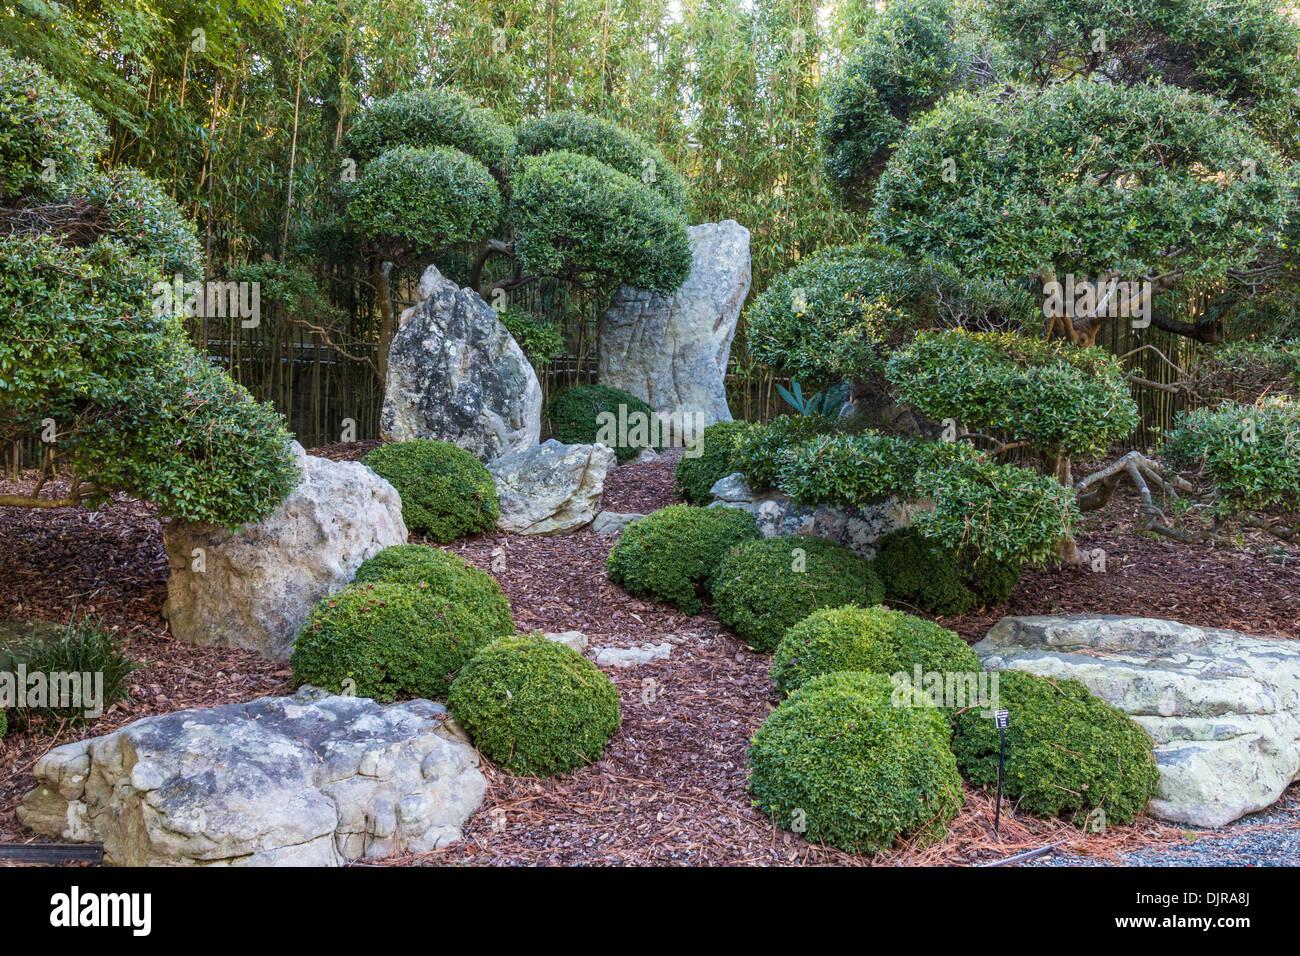 japanese garden at norfolk botanical gardens stock photo: 63207890